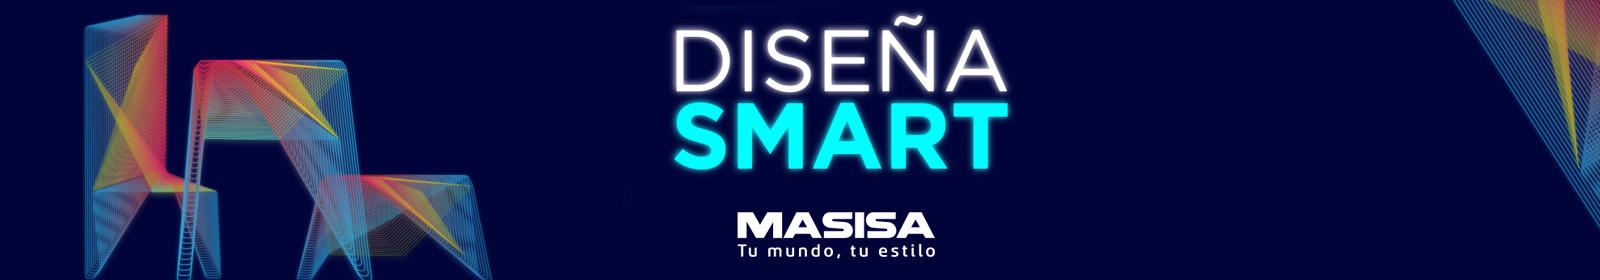 Disena Smart - Concurso Masisa